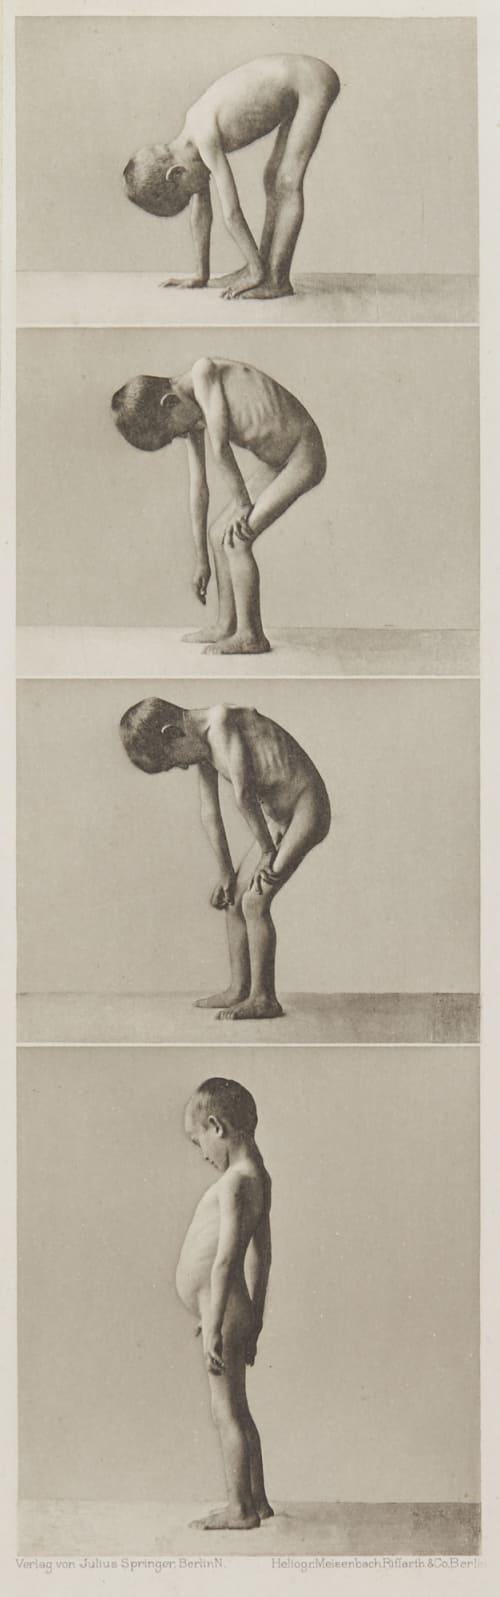 Tafel 8 Curschmann, Dr. H.   (German, 1846-1910)